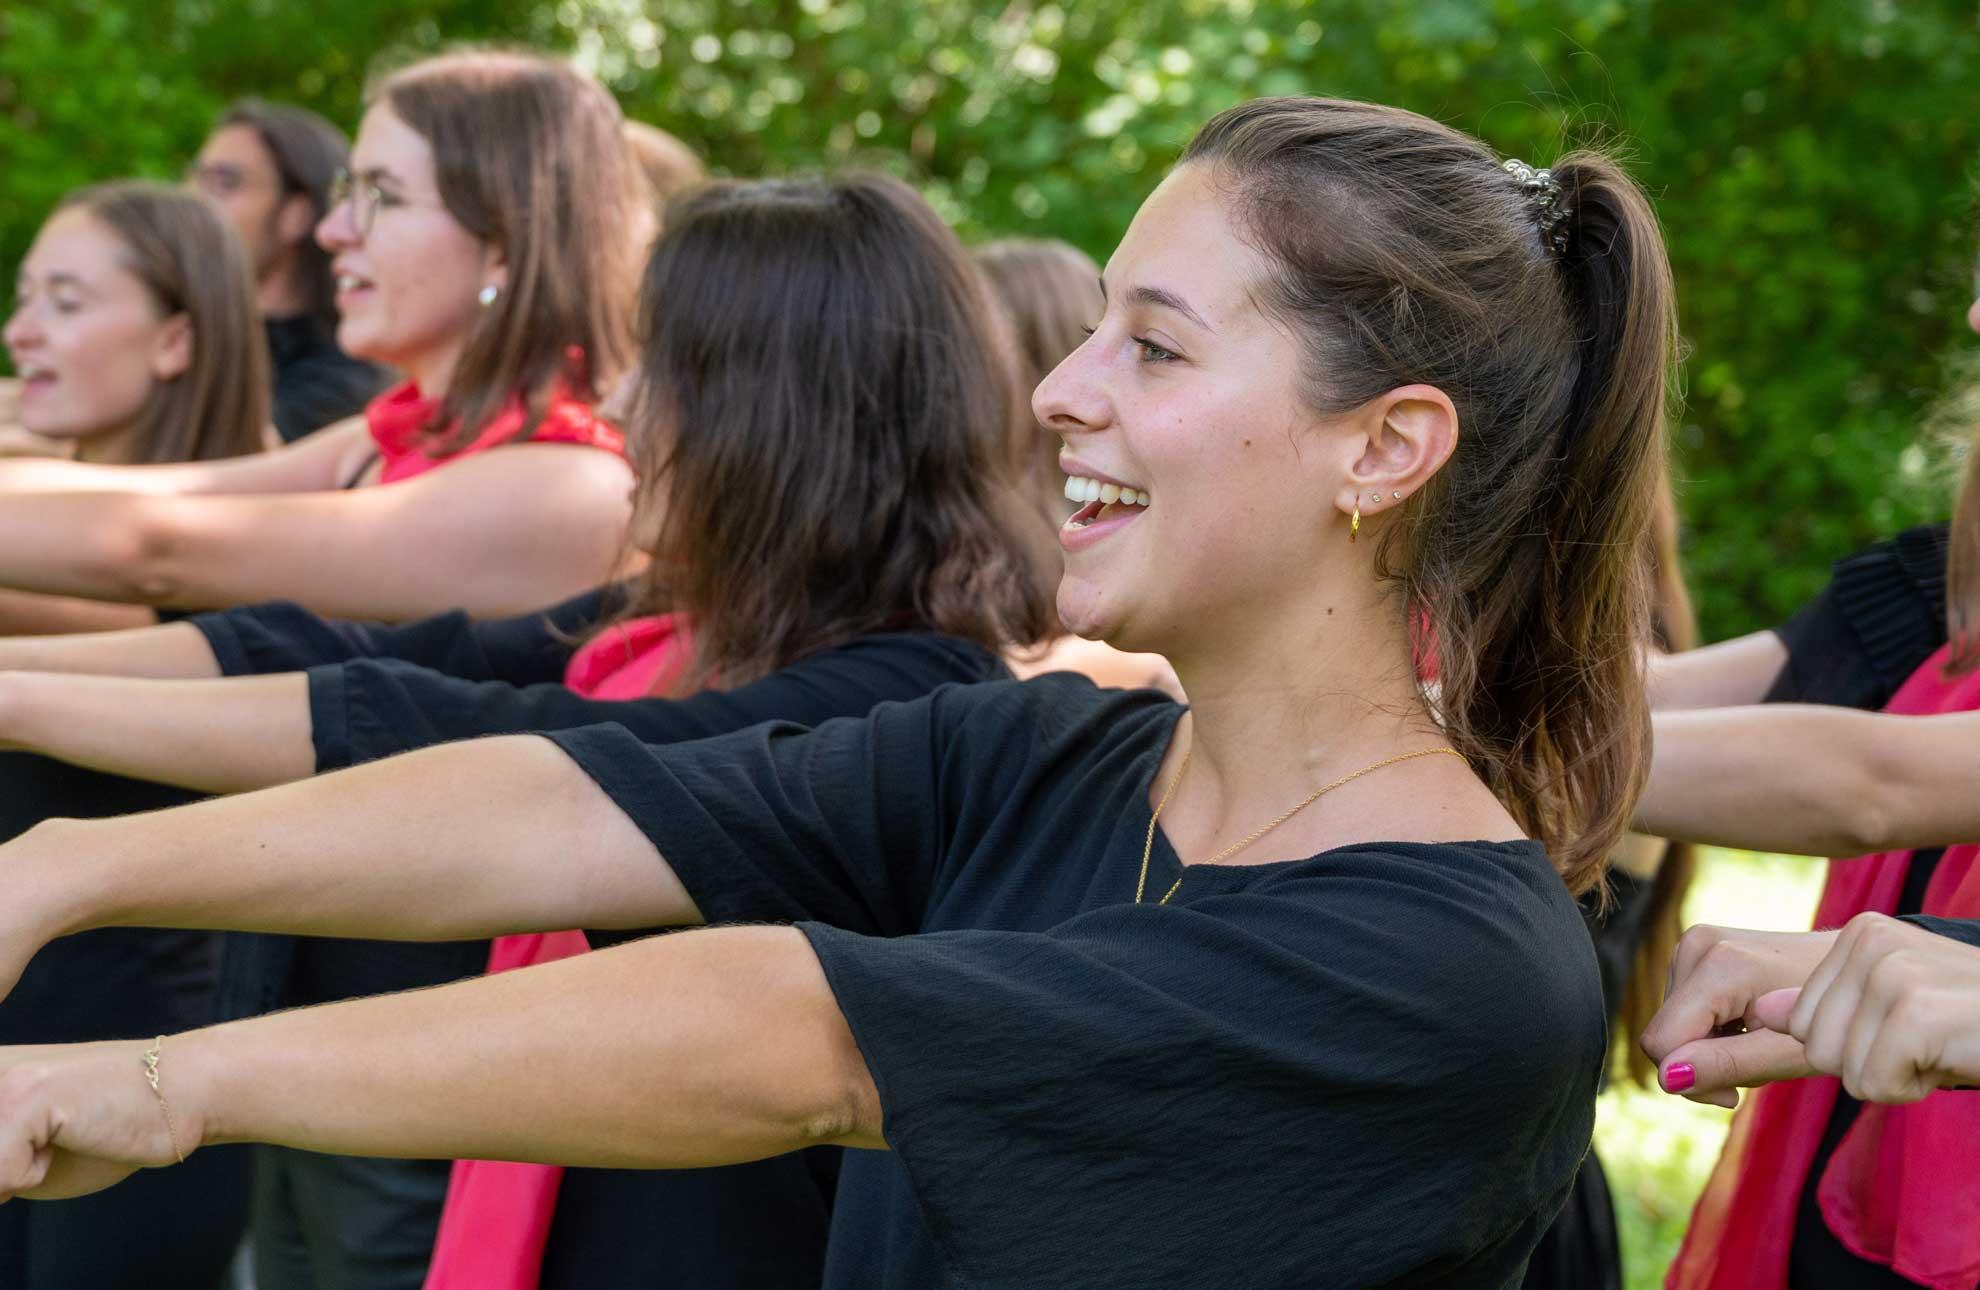 Frauenchor Chorsingtag - Chorverband Burgenland